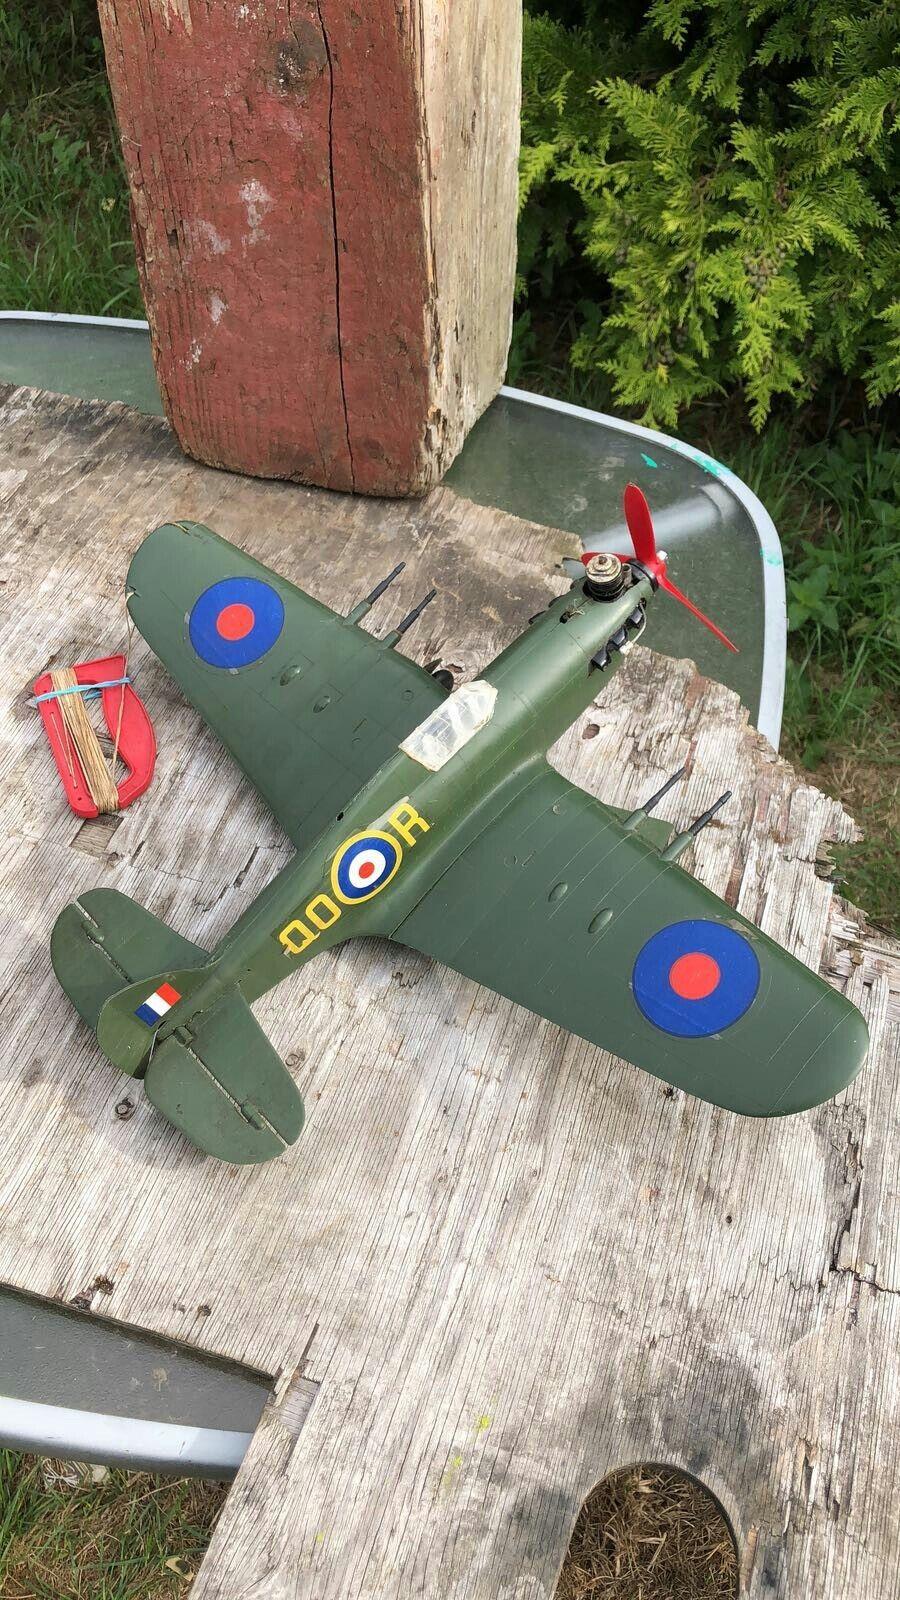 Fantastic Vintage Model Hurricane Aeroplane With Petrol Motor